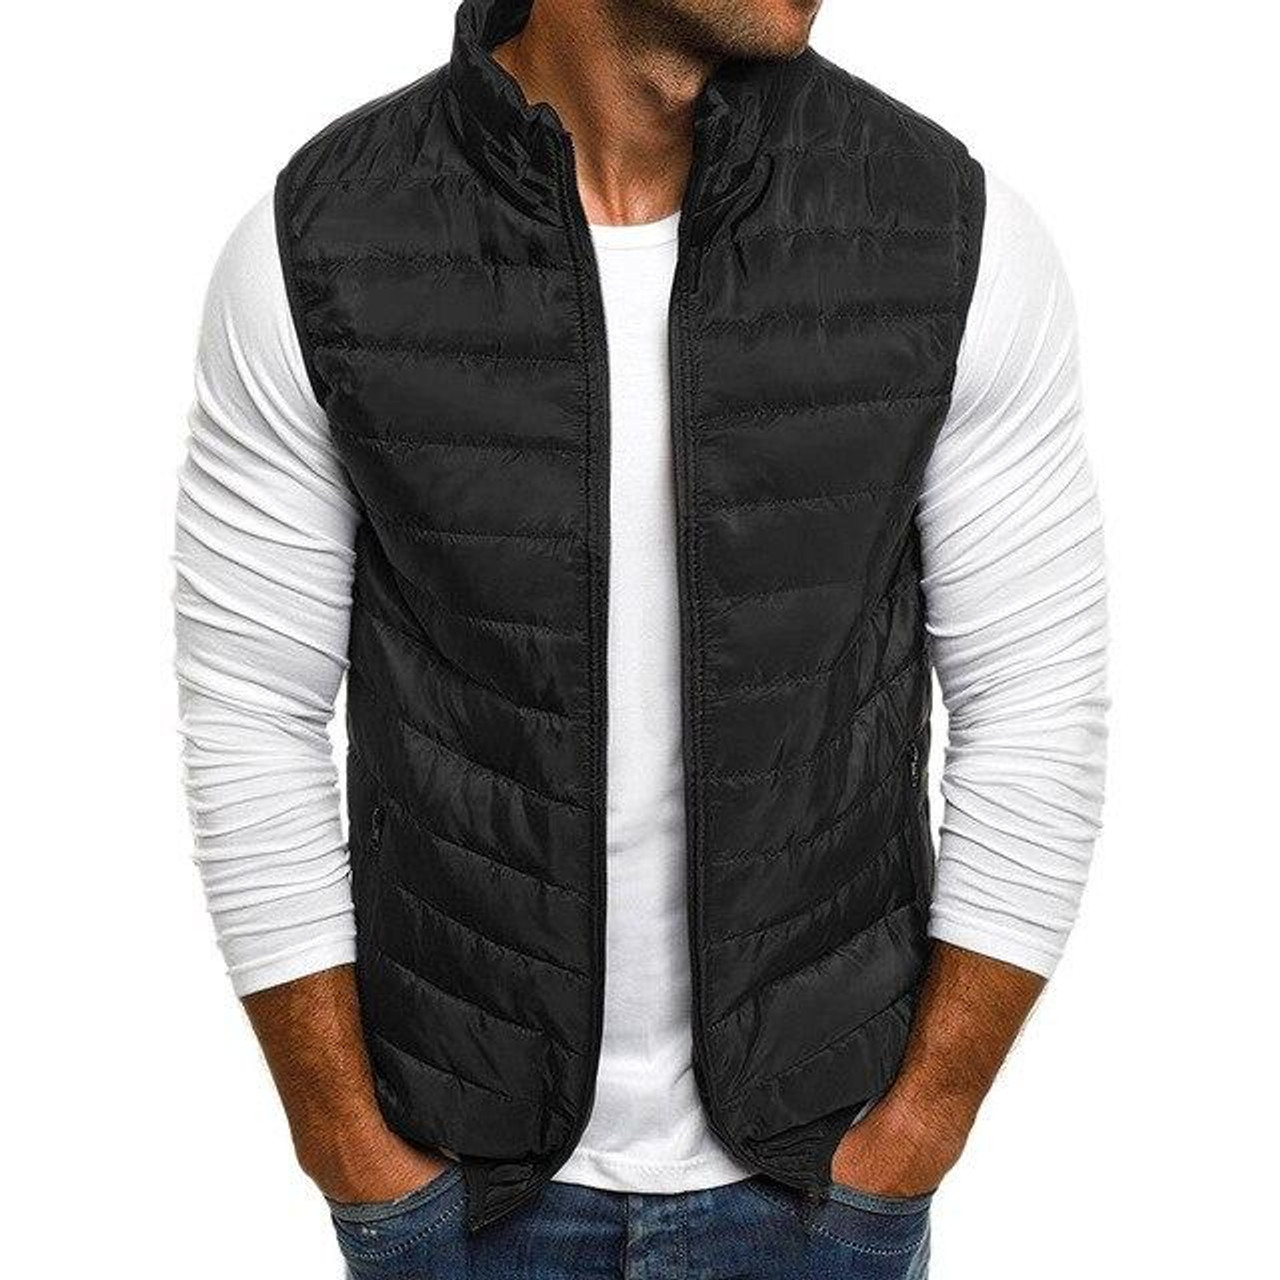 Zogaa 2020 Winter Fashion Mens Parka Vest Casual Outerwear Jacket Coat Men Sleeveless Waistcoat Men Parka